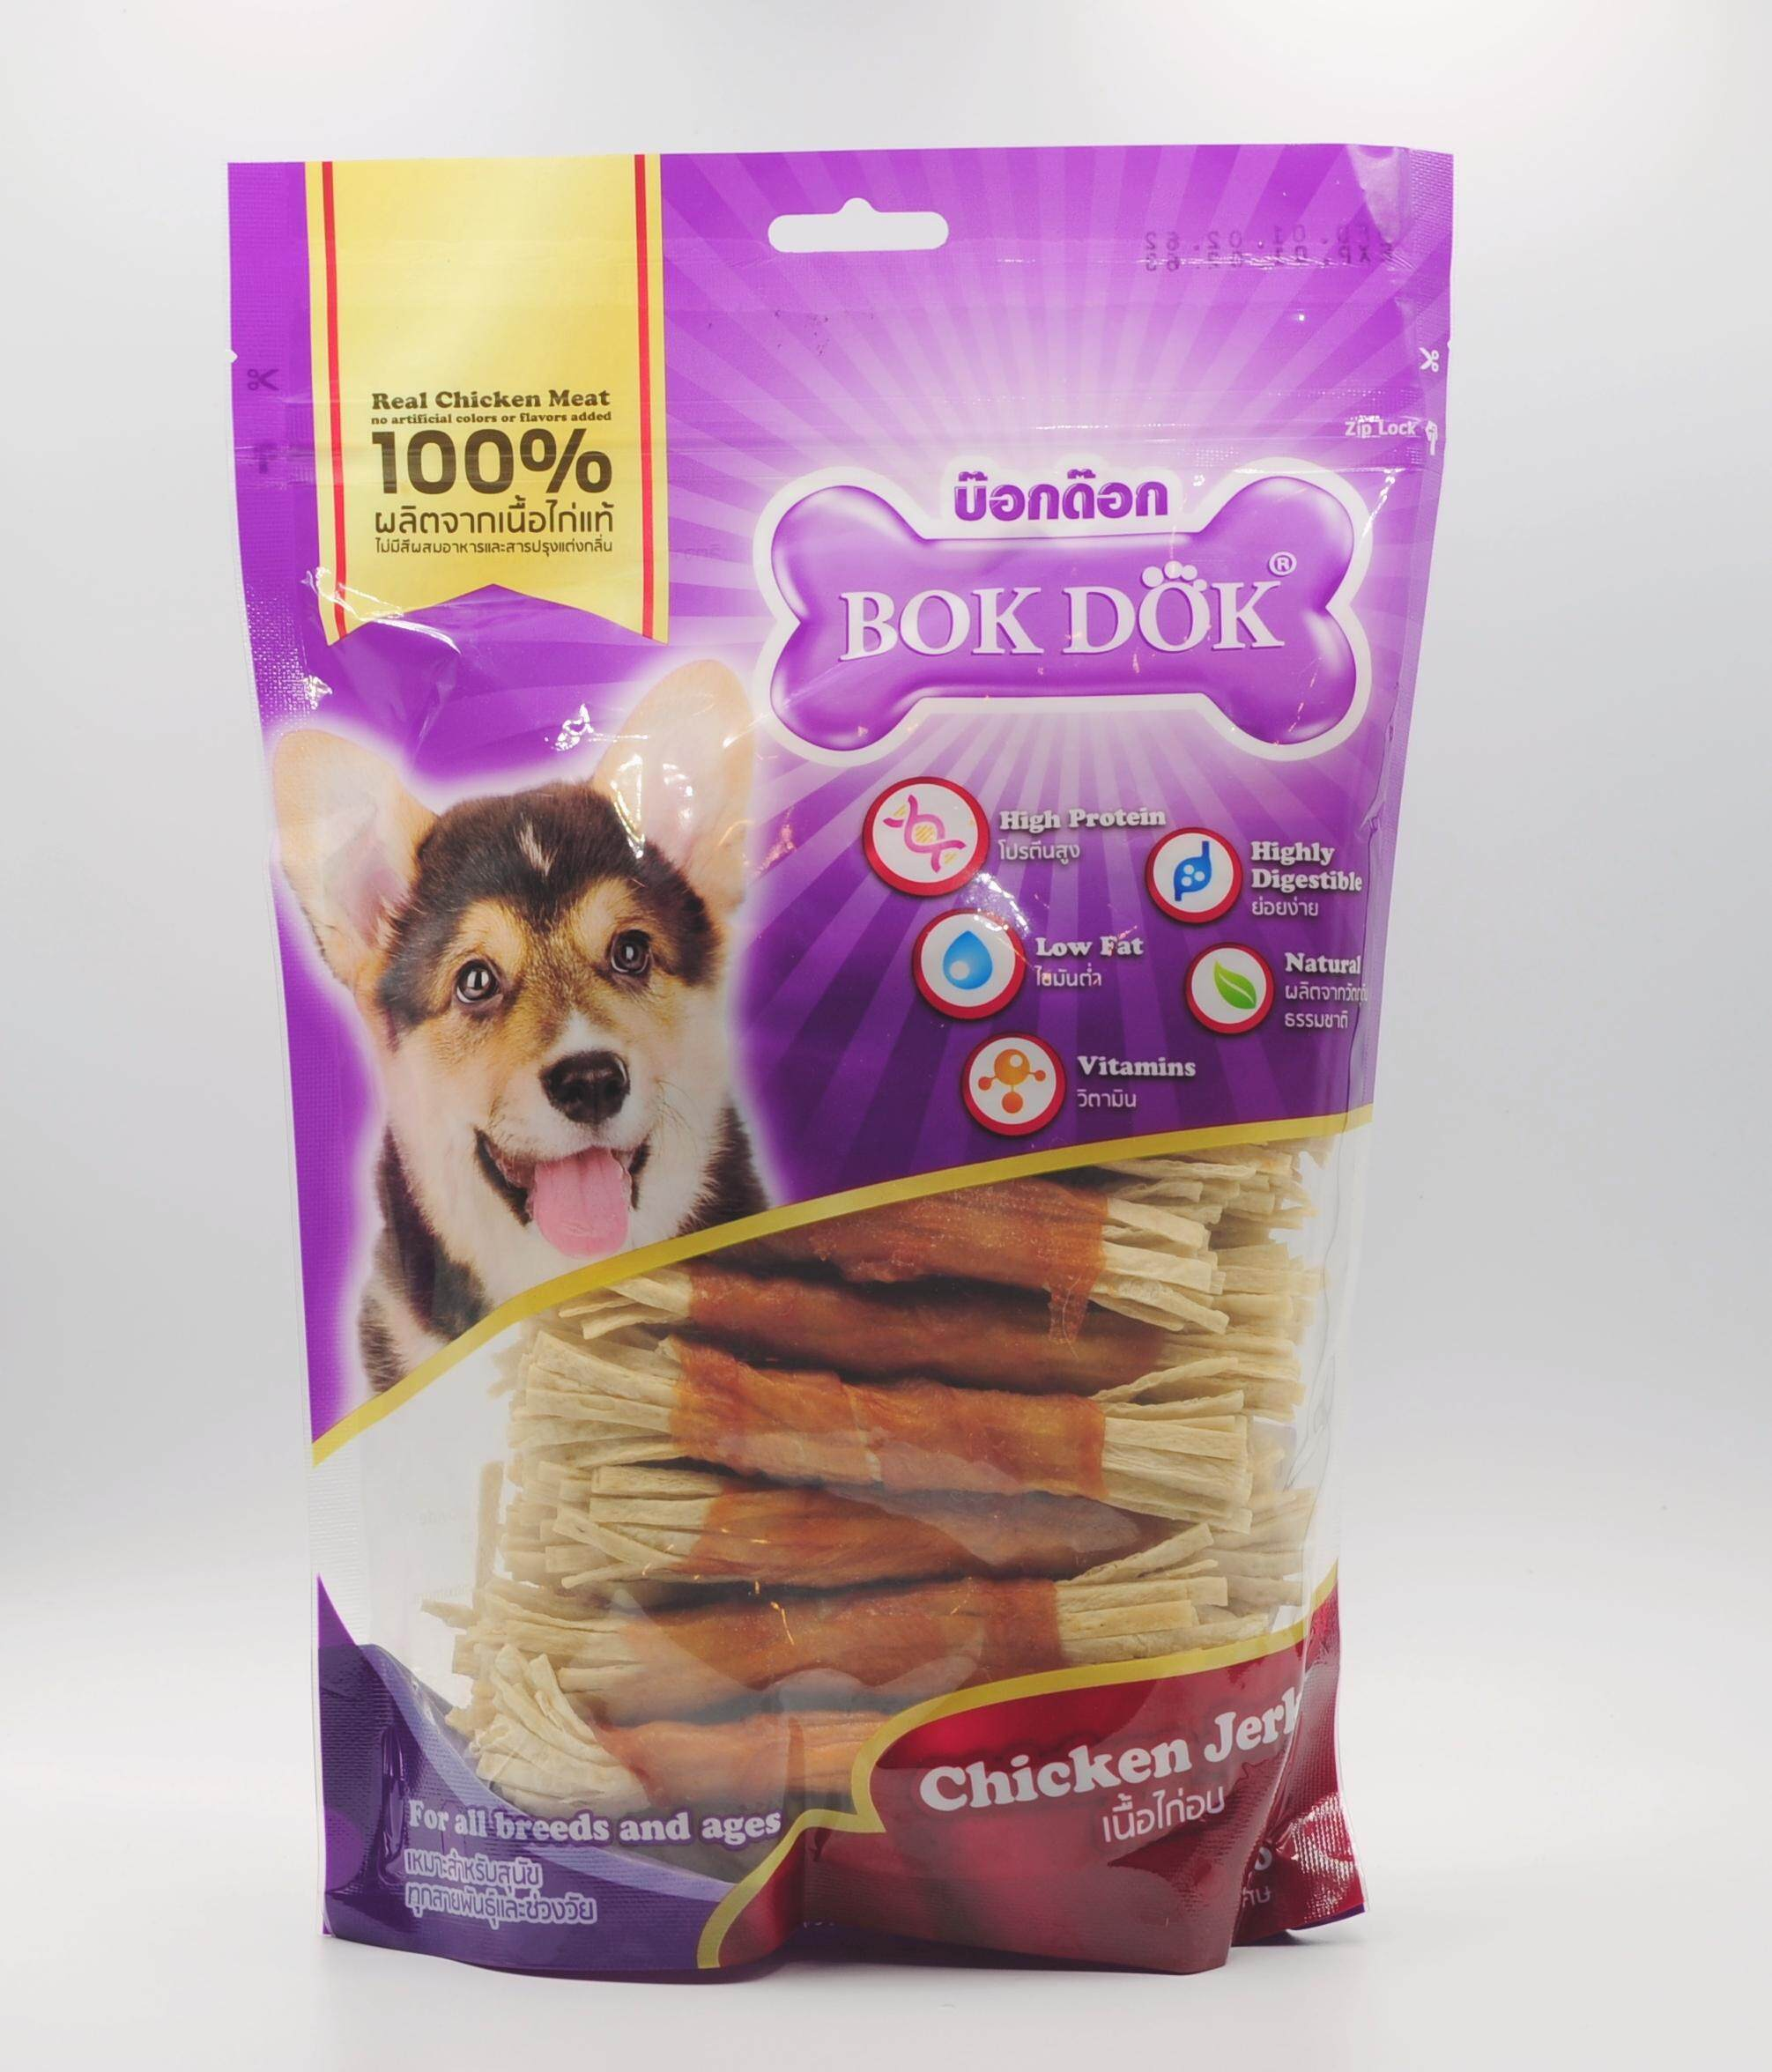 Bok Dok Ck87 K ไก่พันปลาเส้น 30 ชิ้น / Chicken Wrapped Fish Snack 30 Pcs. By Happy Paws Pet Shop.